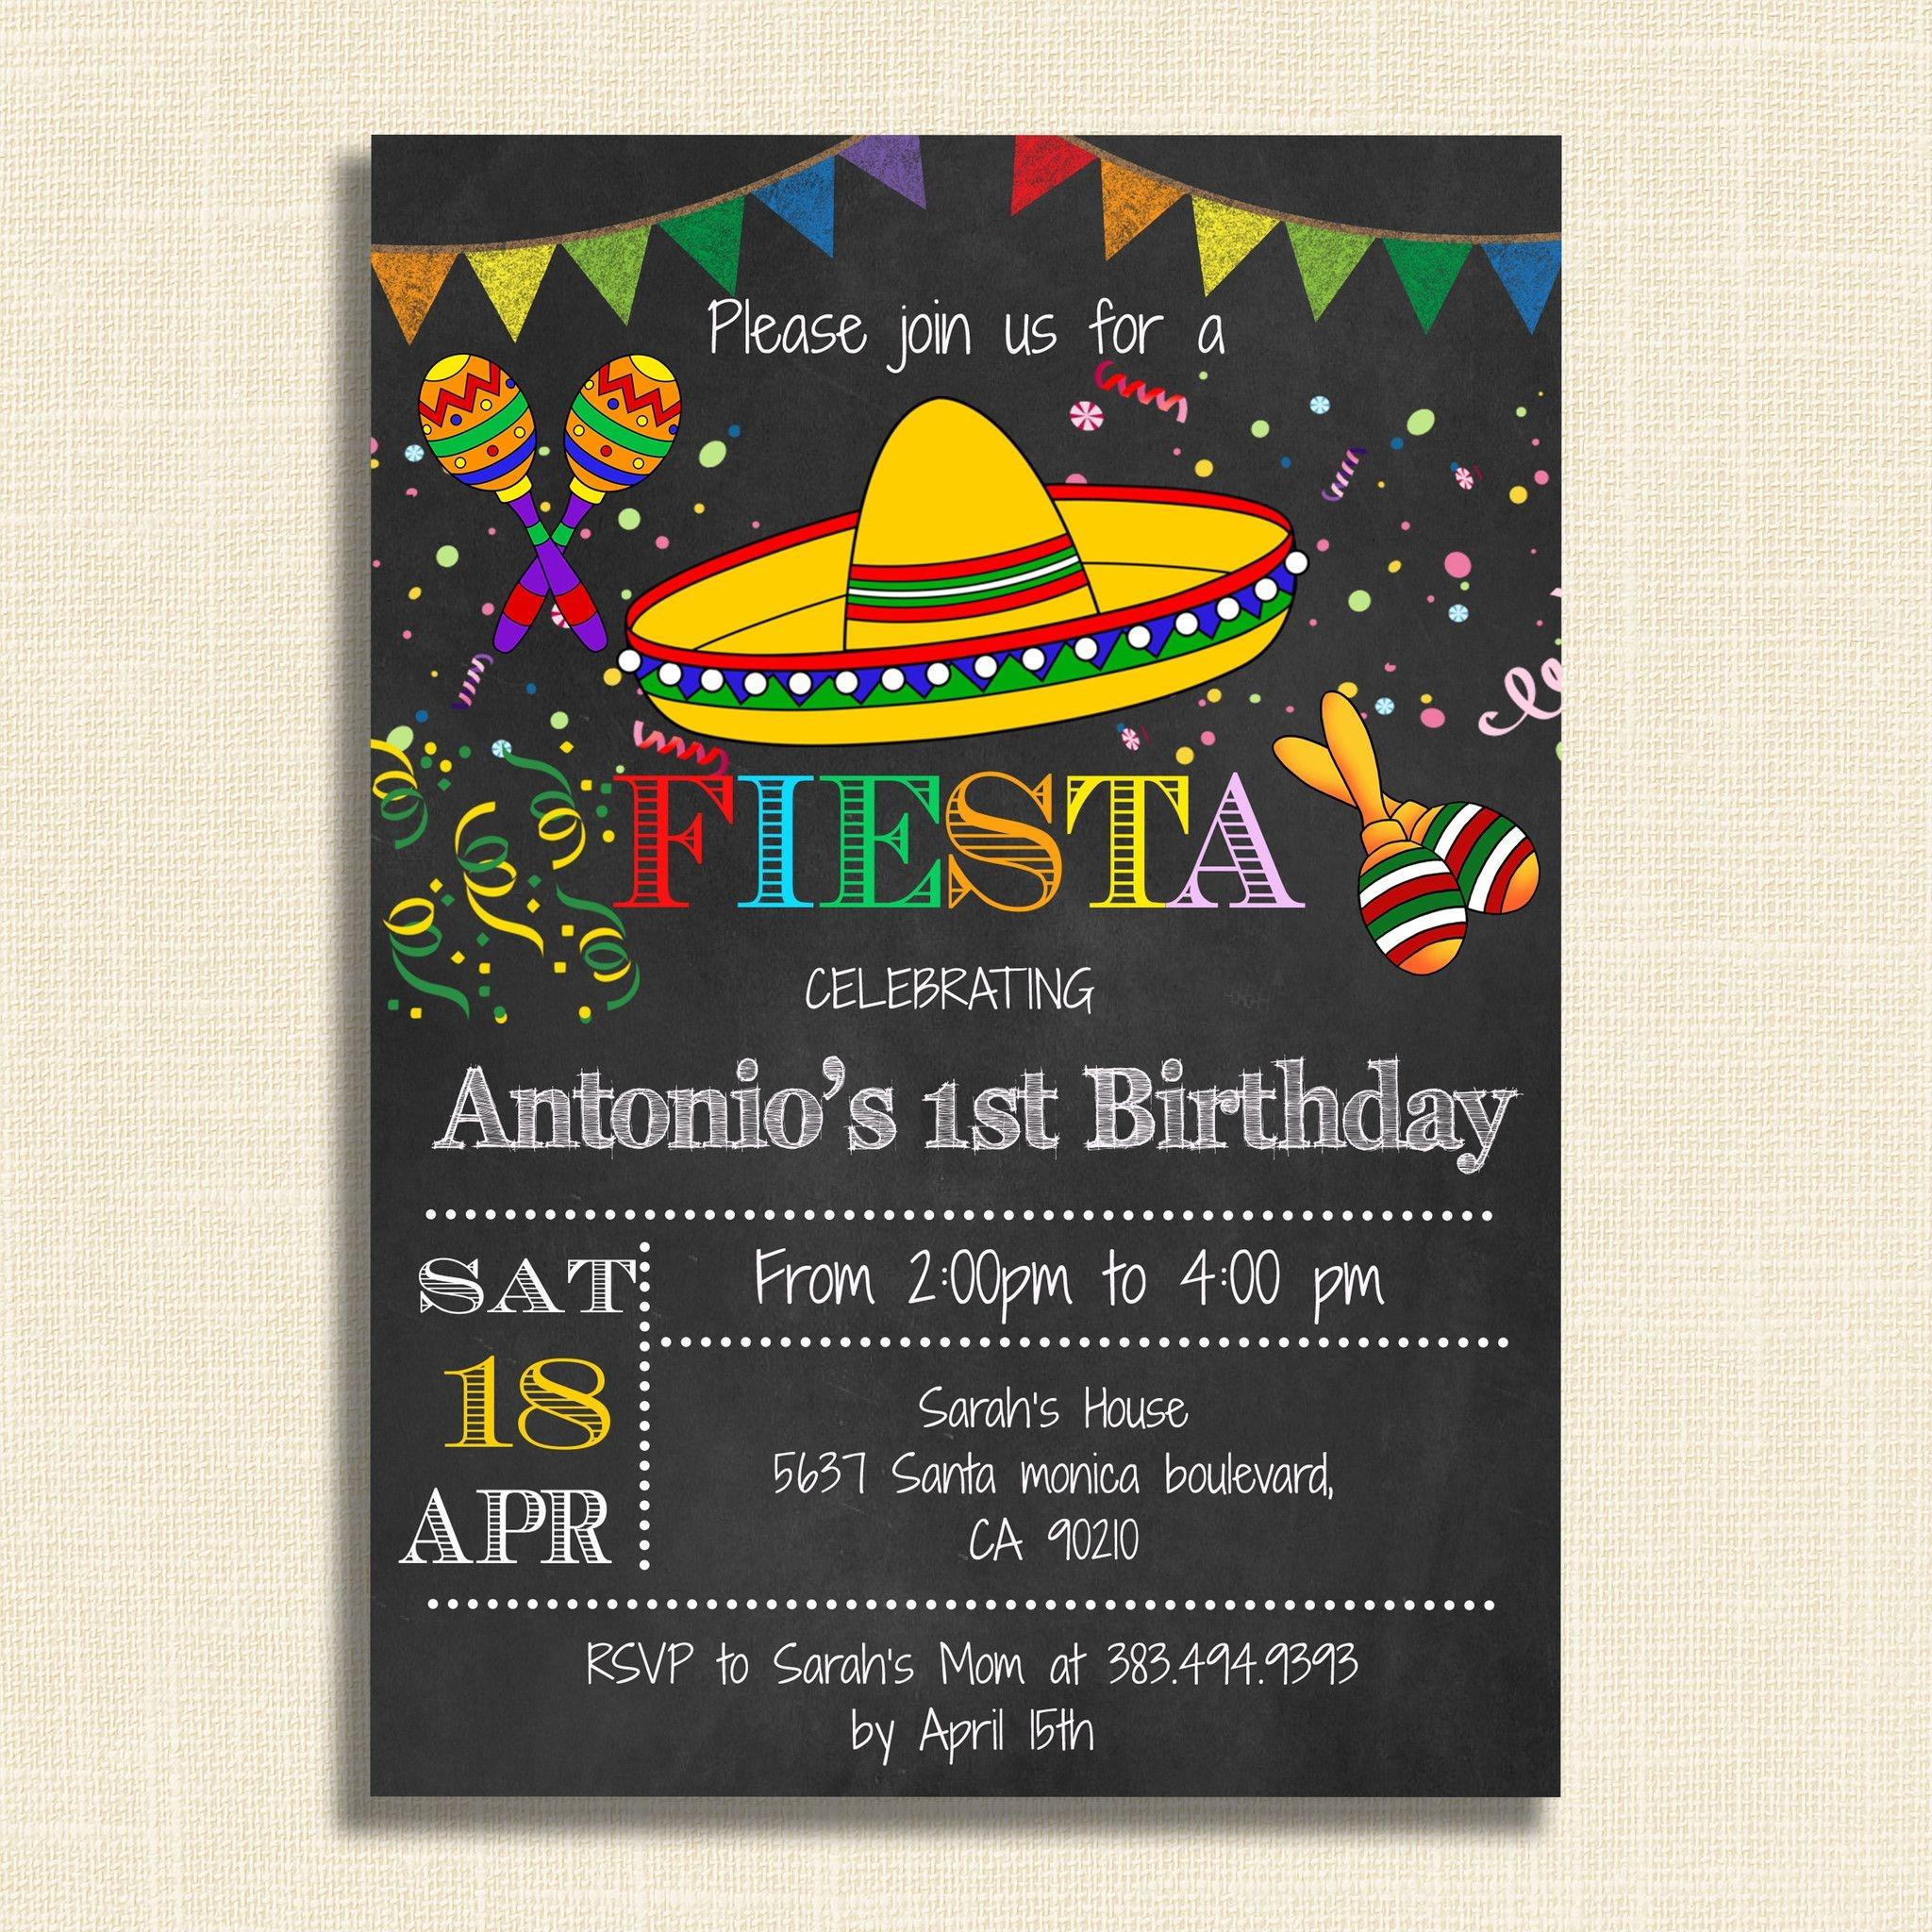 Printable Mexican Fiesta Party Invitations – Diy Party Invitation - Free Printable Mexican Fiesta Invitation Templates